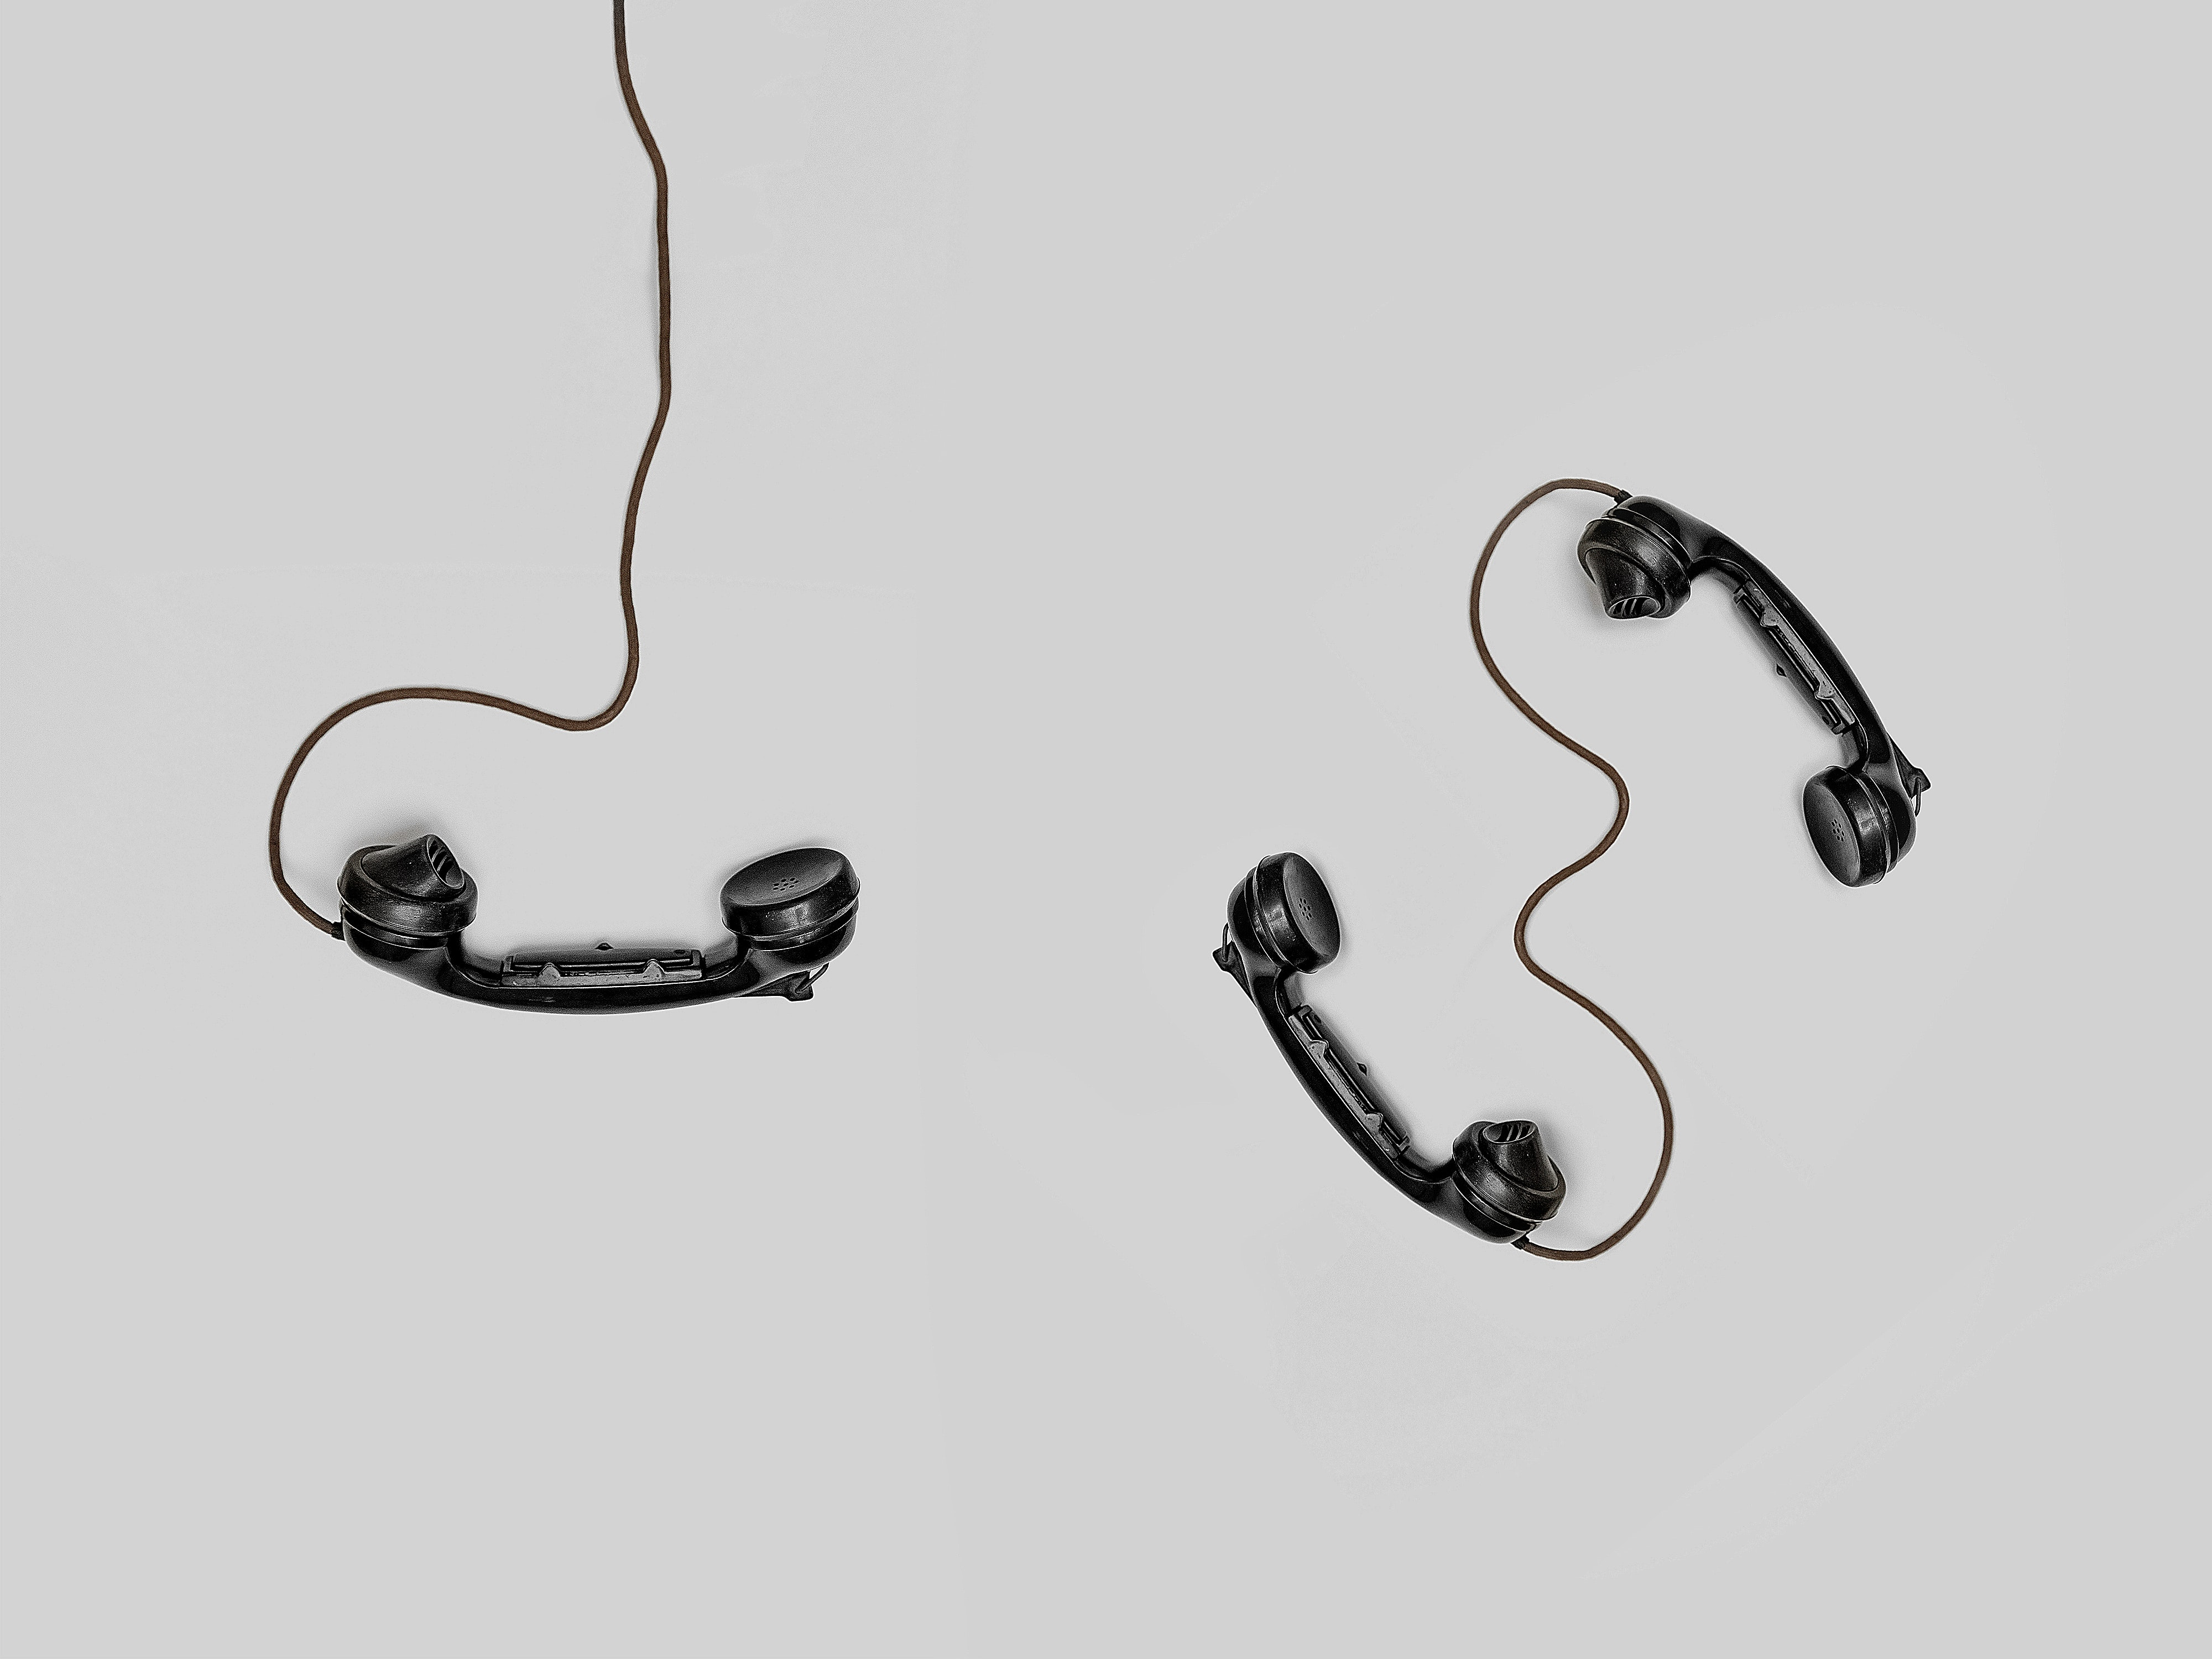 voicebot w call center